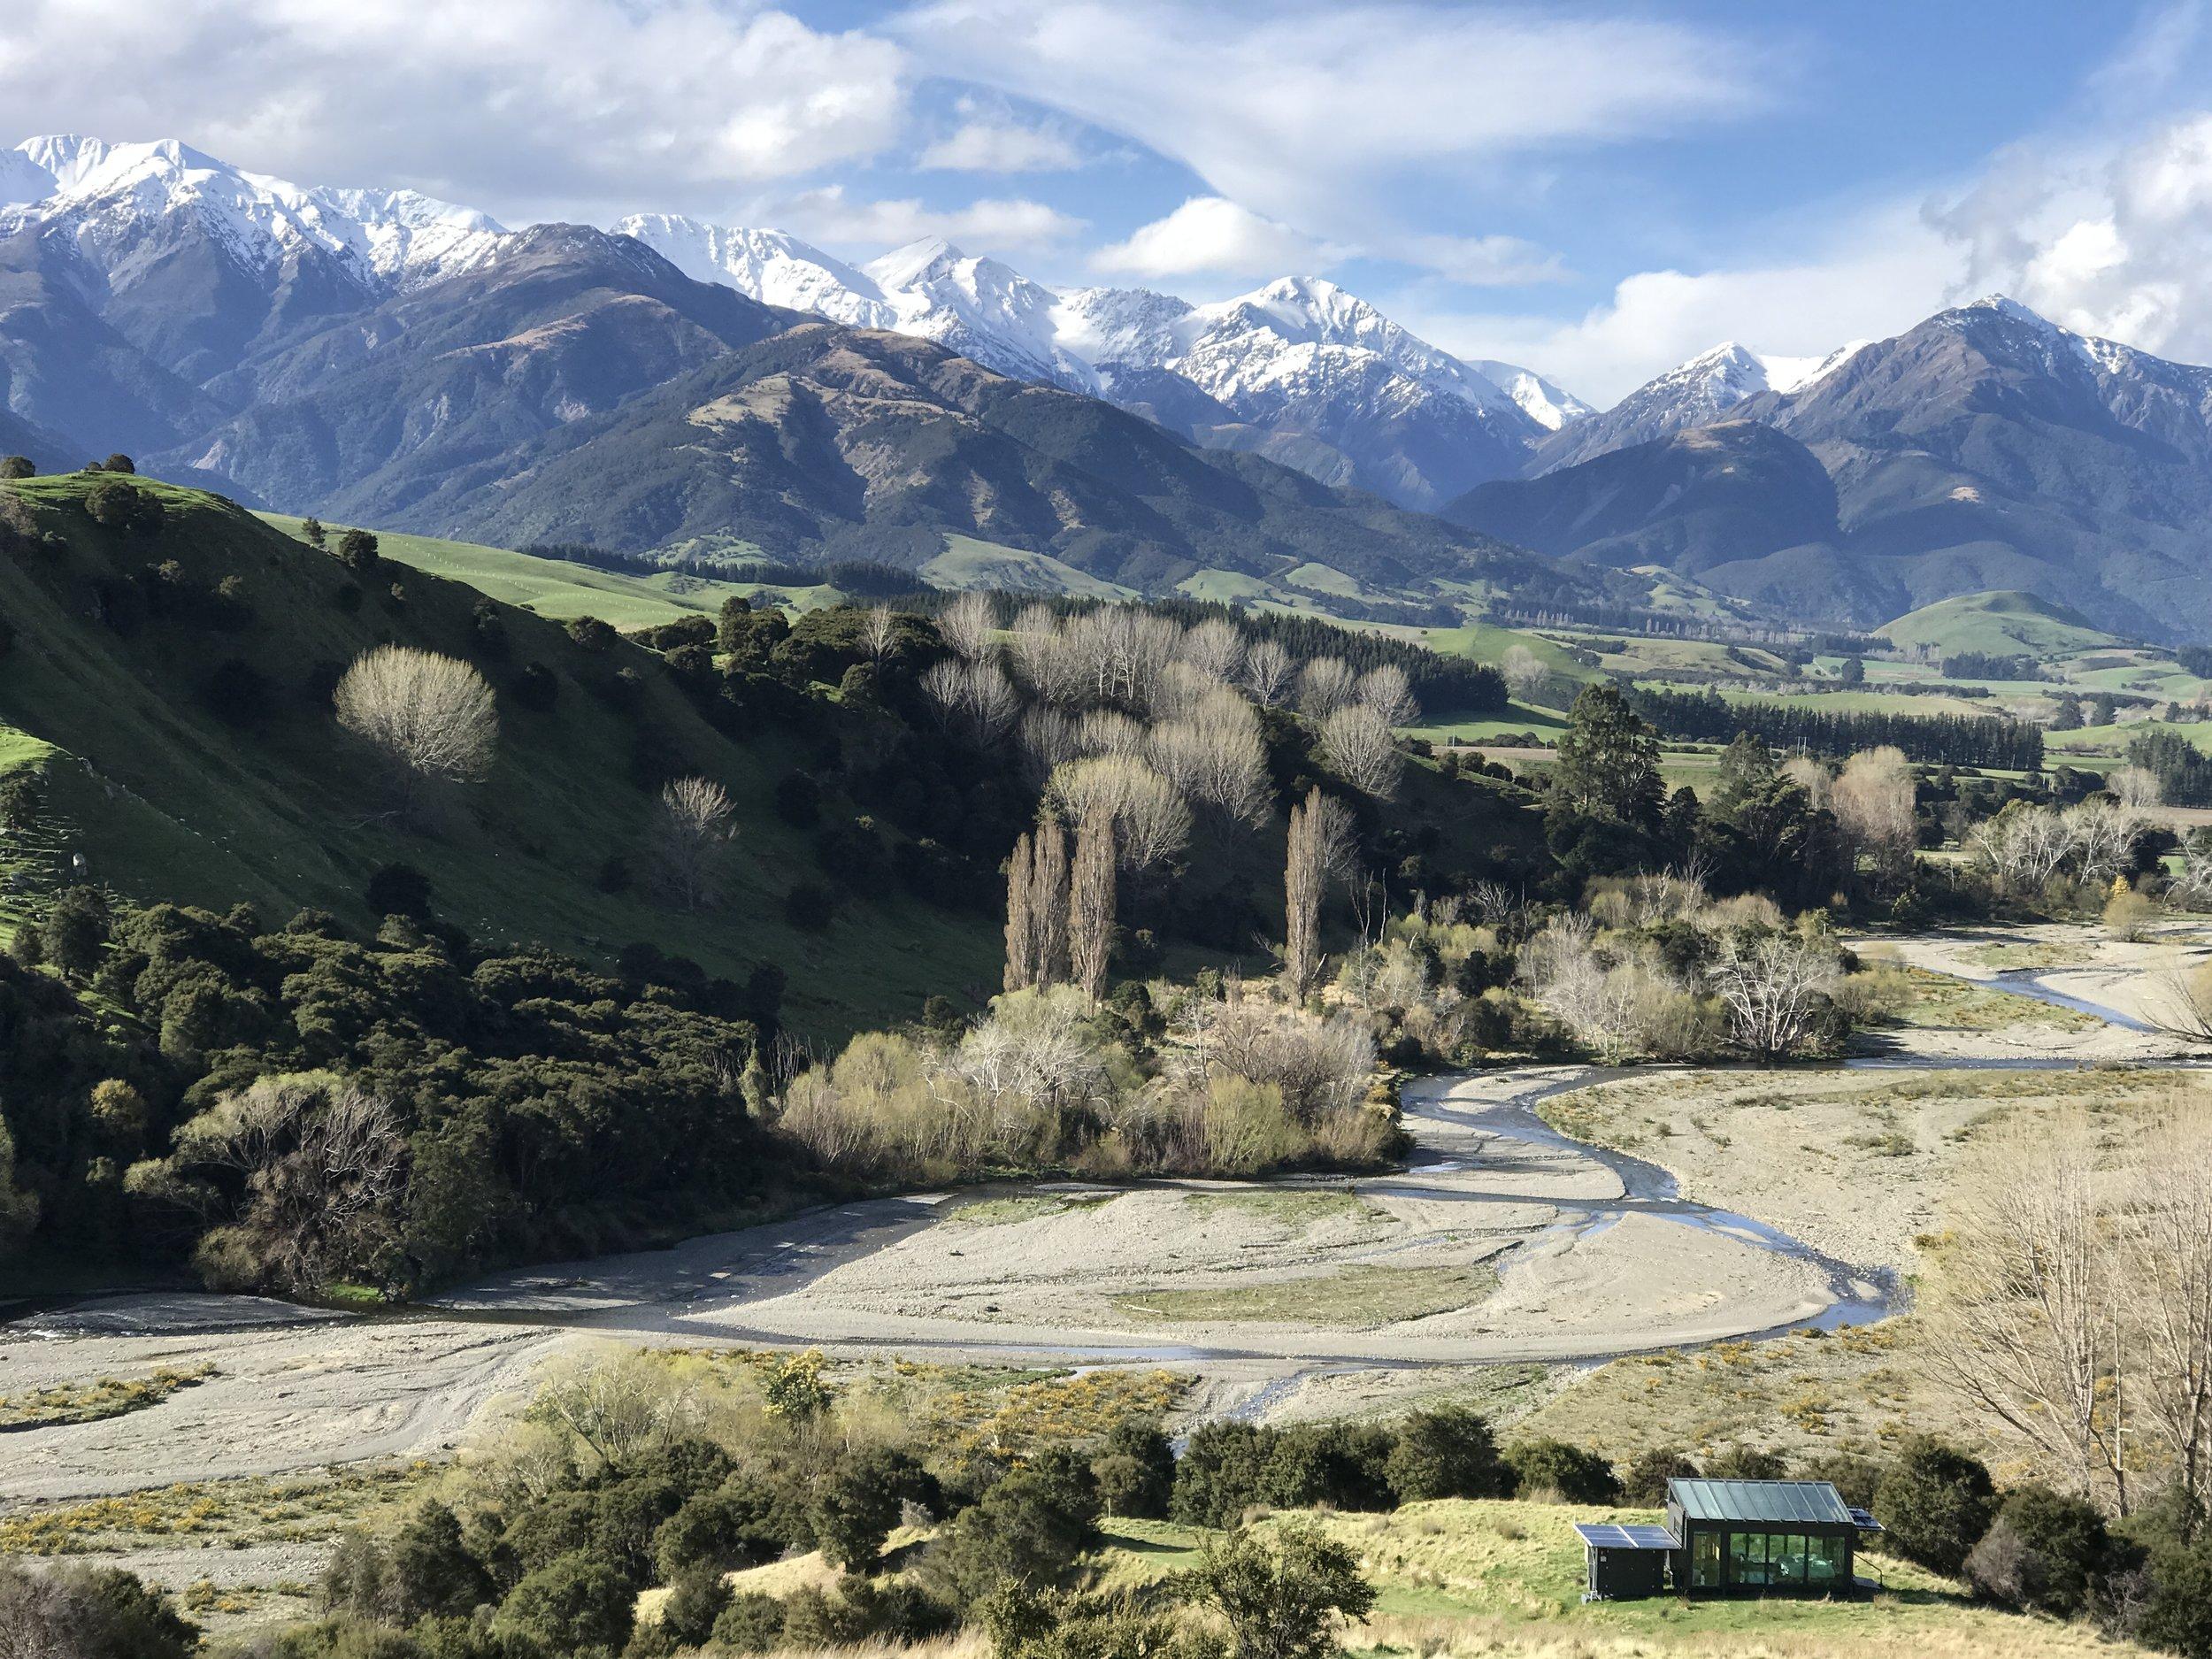 Kahutara, Kaikōura. New Zealand (image by Jacqui Gibson).